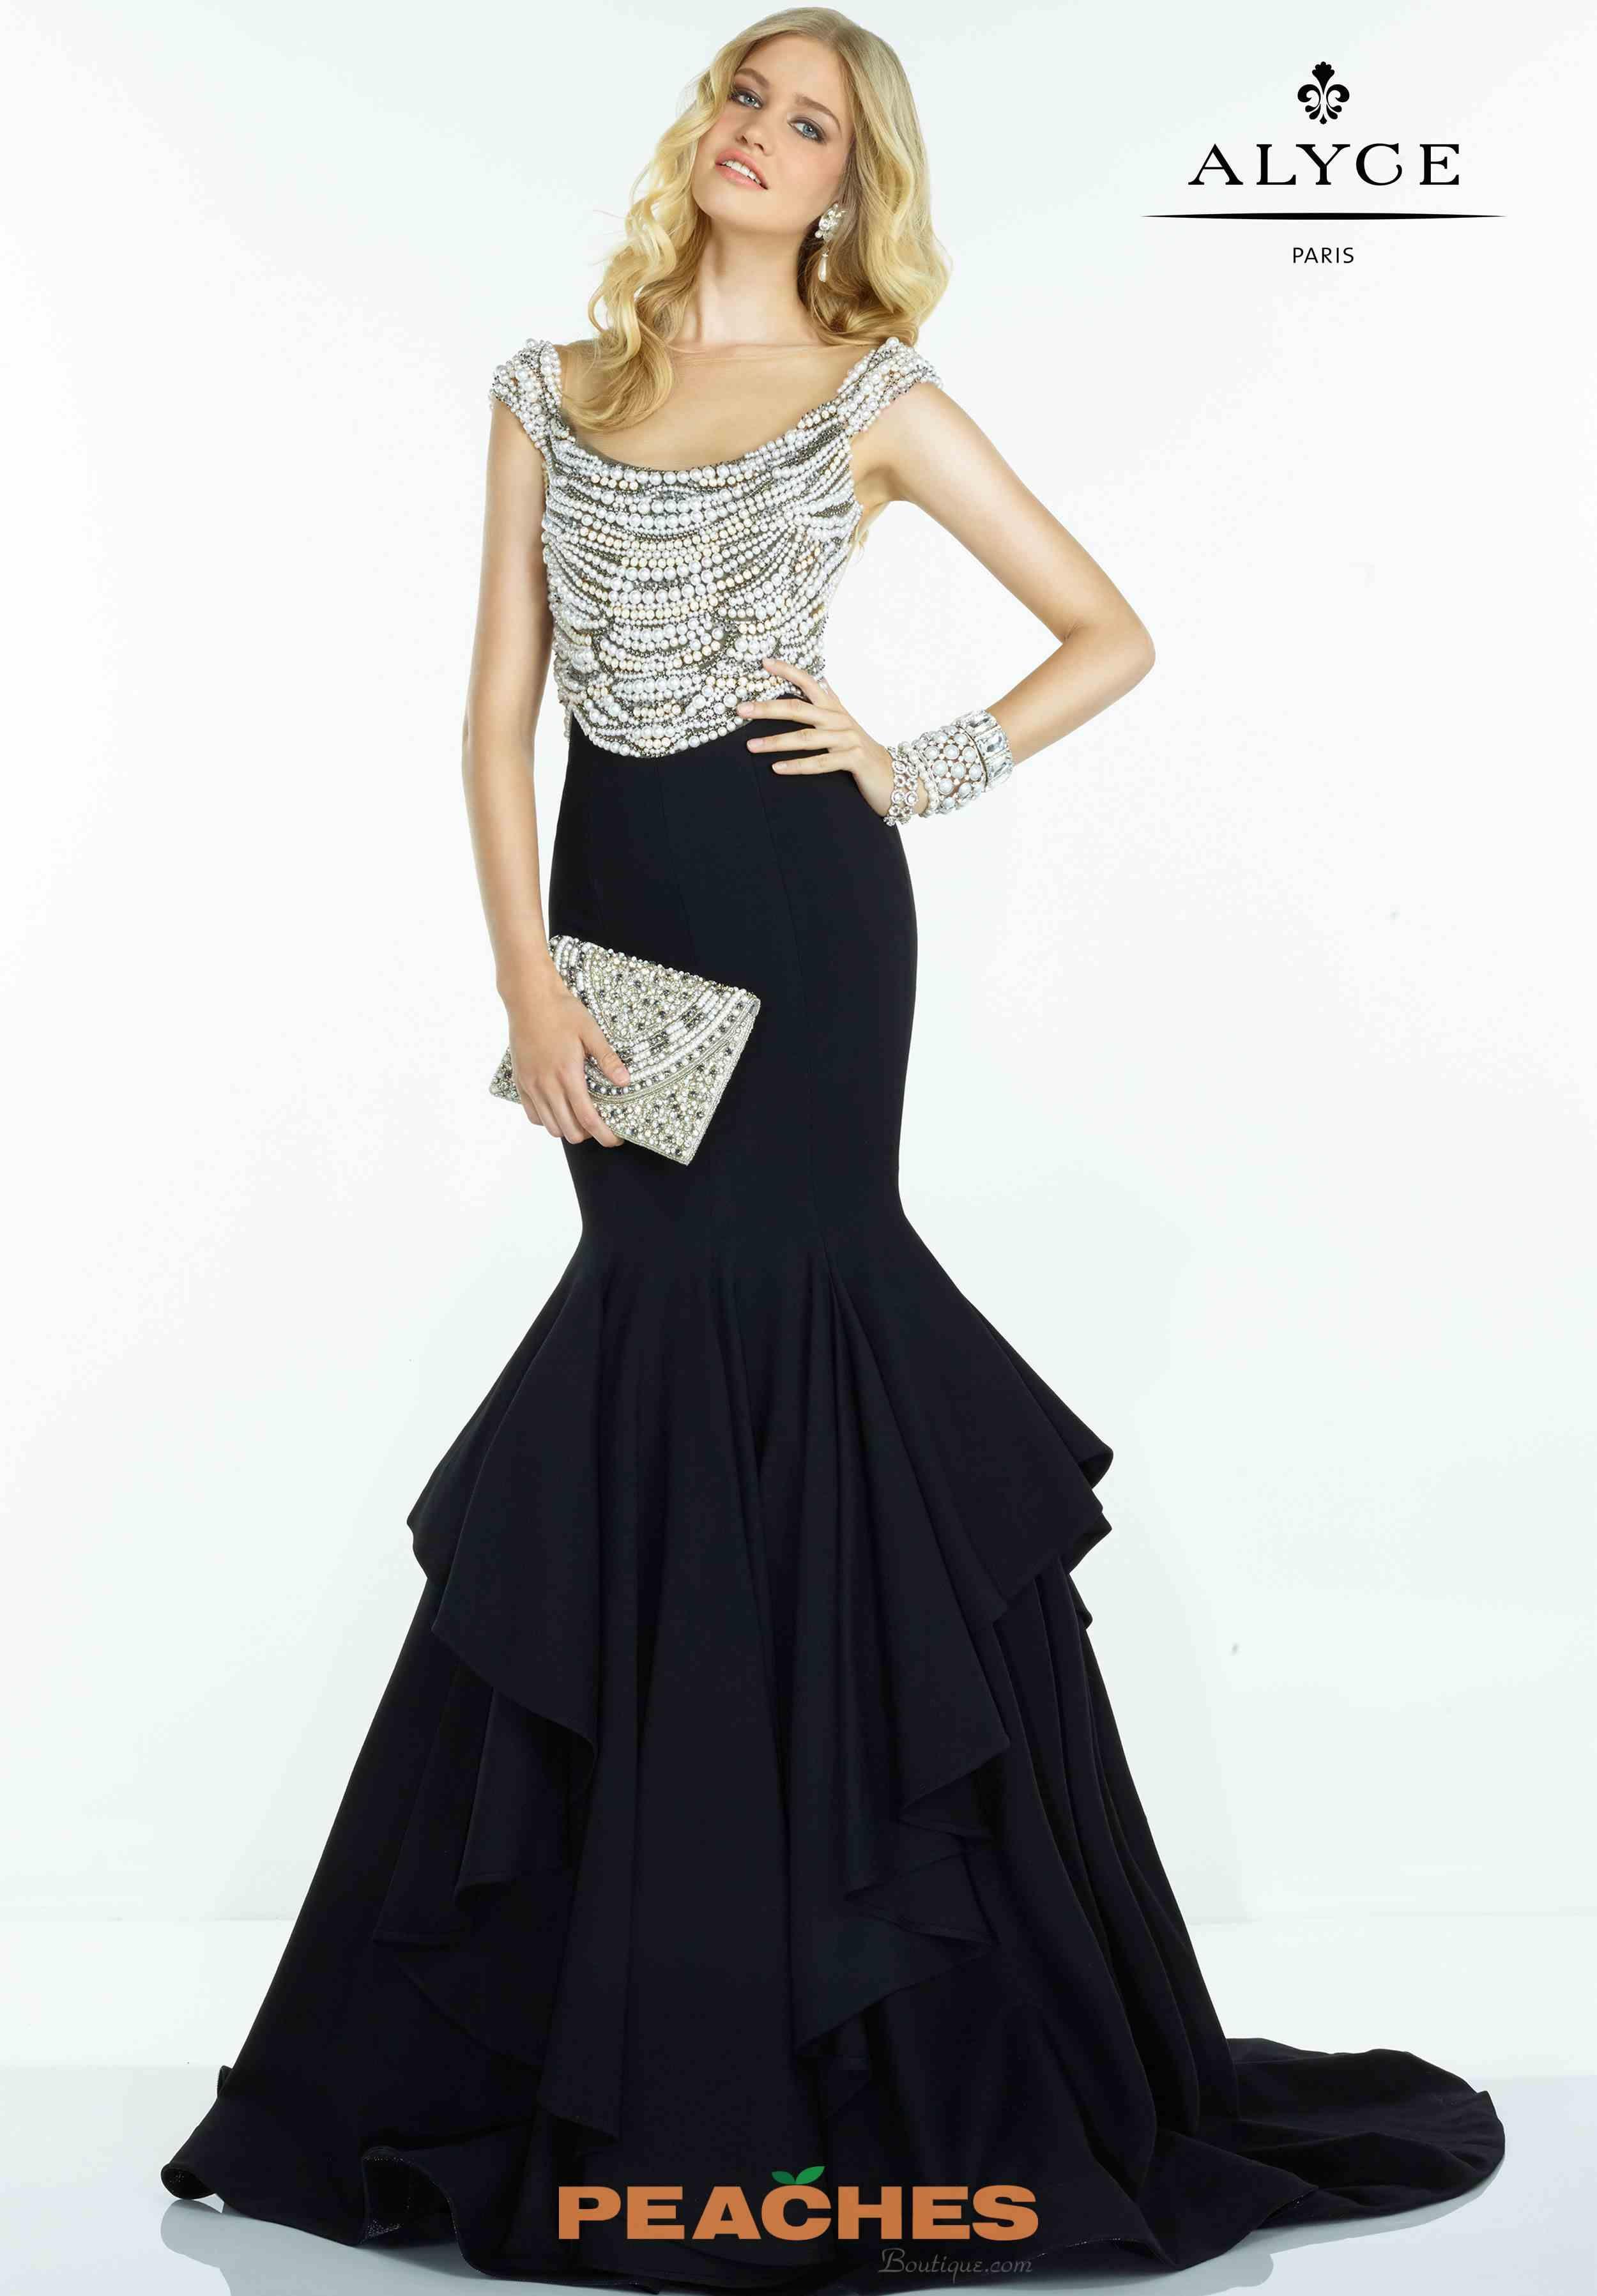 Blackdiamond white weddingguest attire pinterest uxui